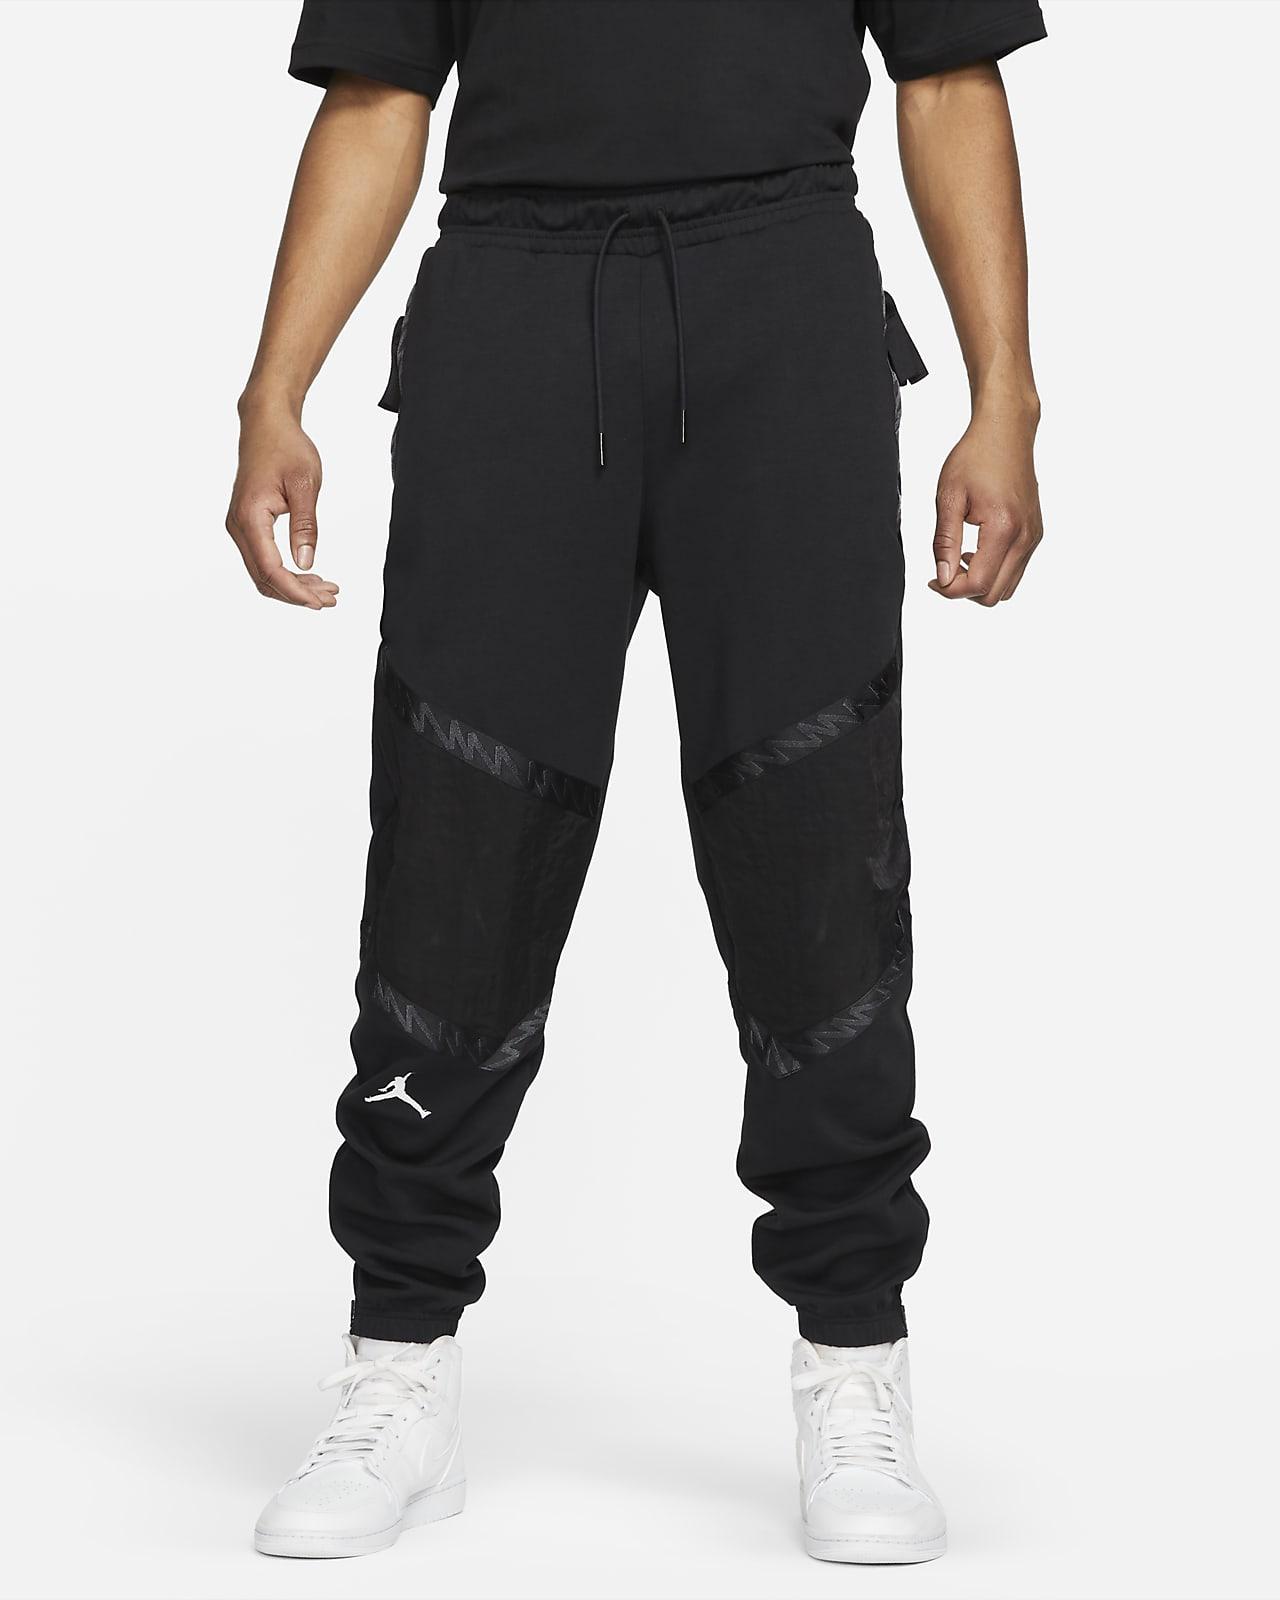 Jordan Dri-FIT Zion Pantalons de teixit Fleece - Home